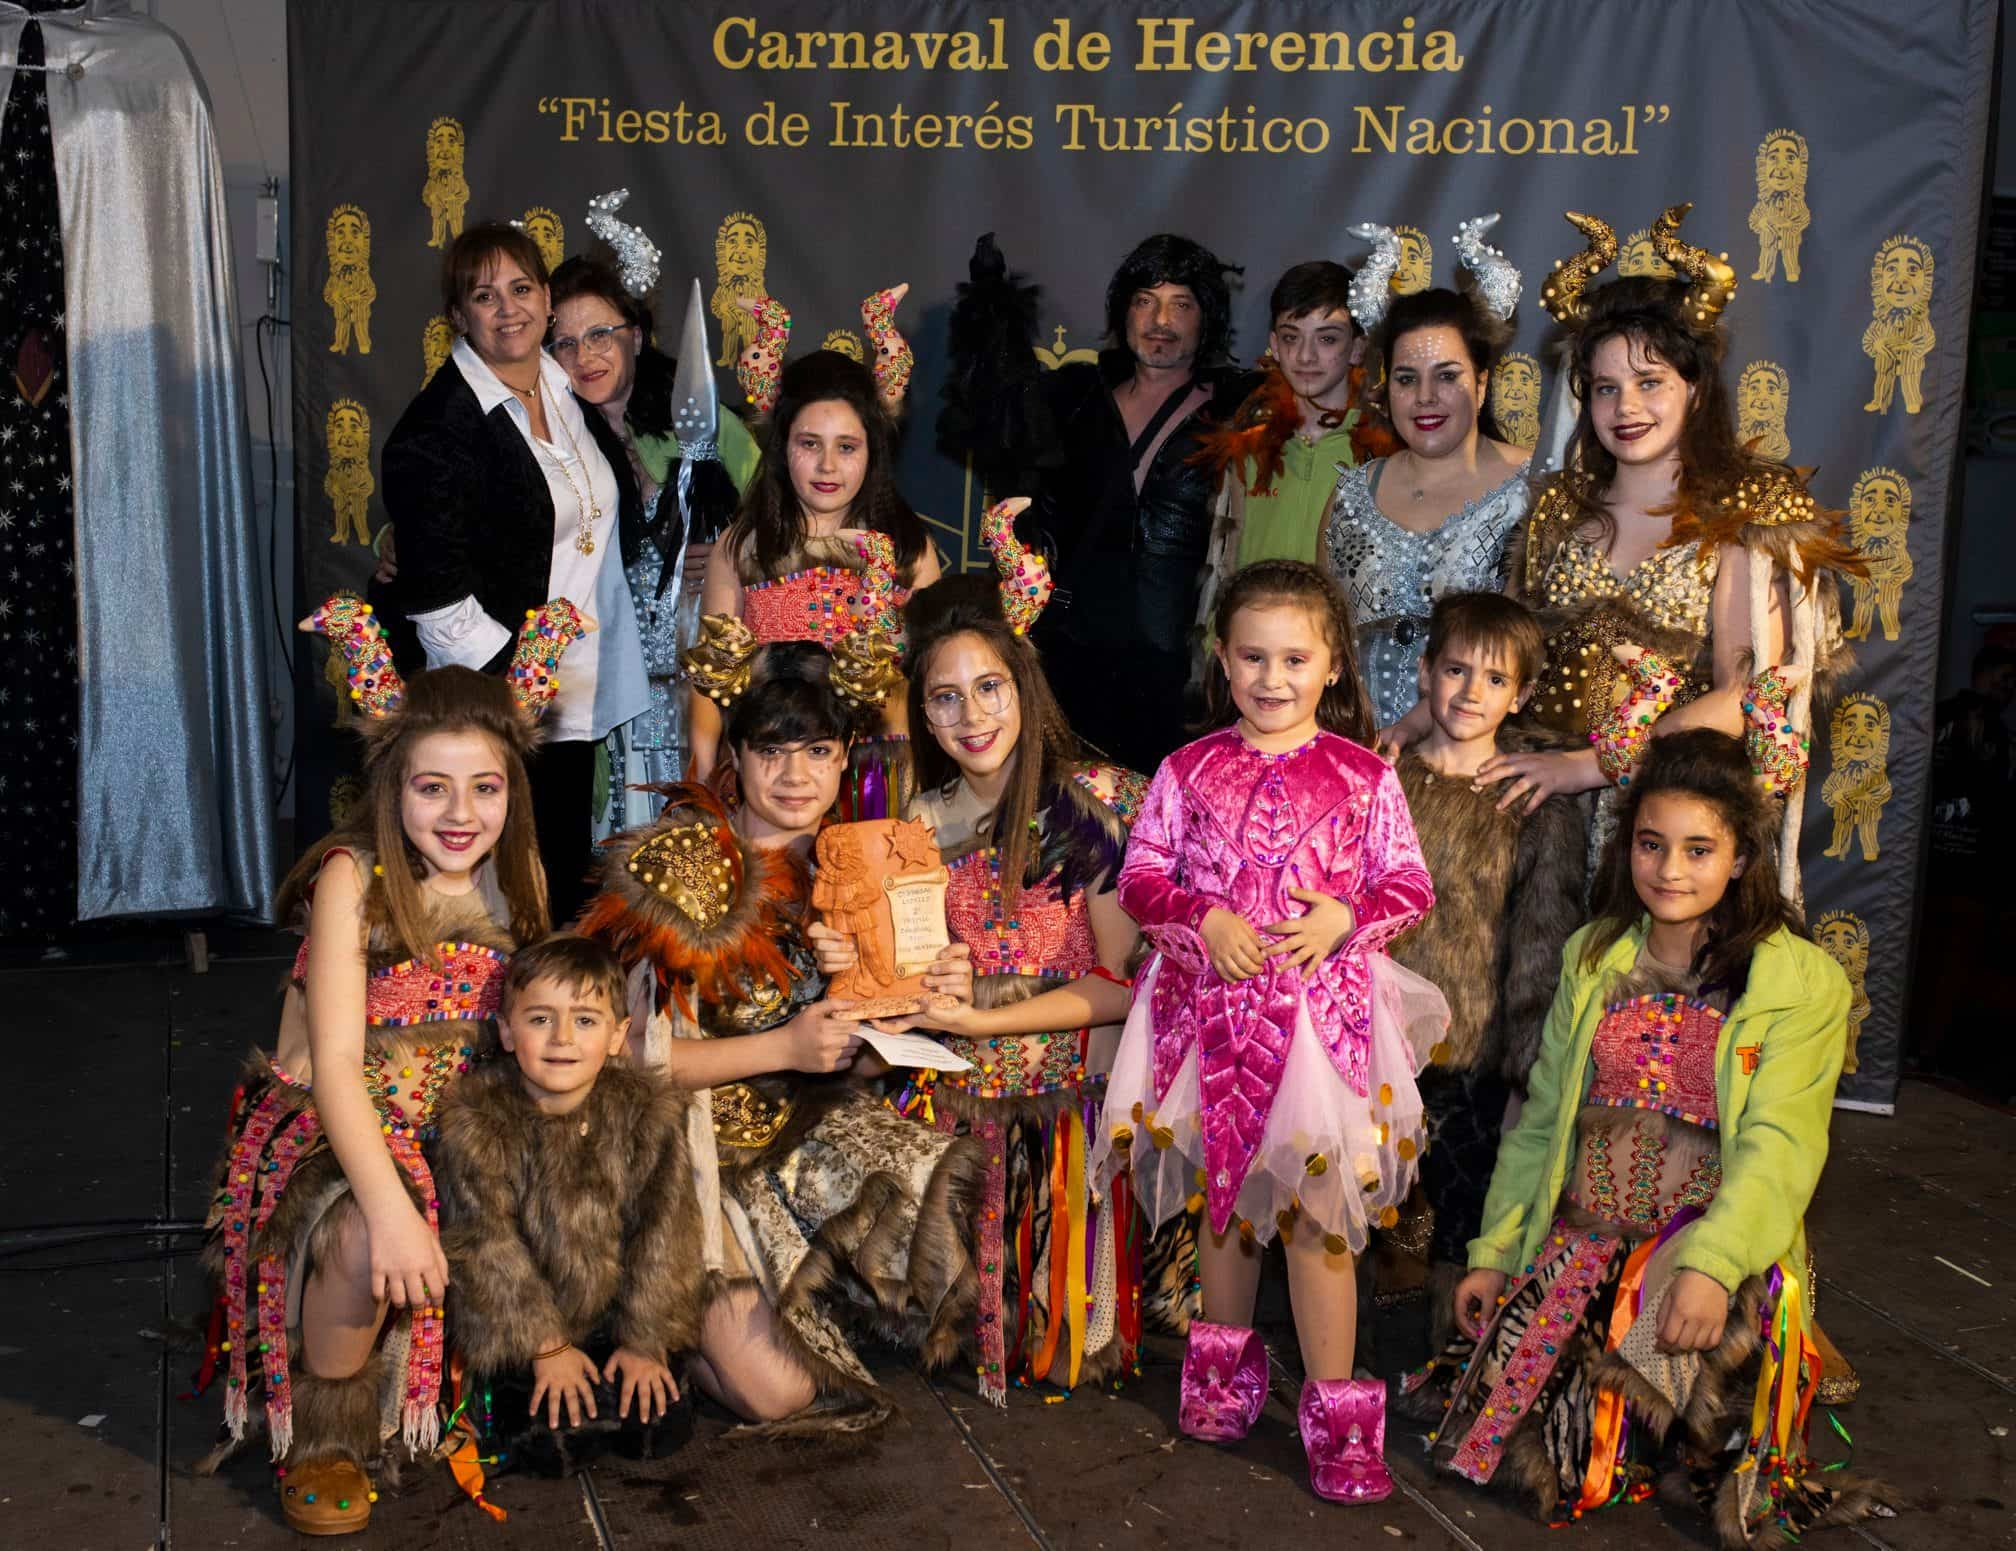 Carnaval de herencia 2020 ofertorio 138 - Selección de fotografías del Ofertorio del Carnaval de Herencia